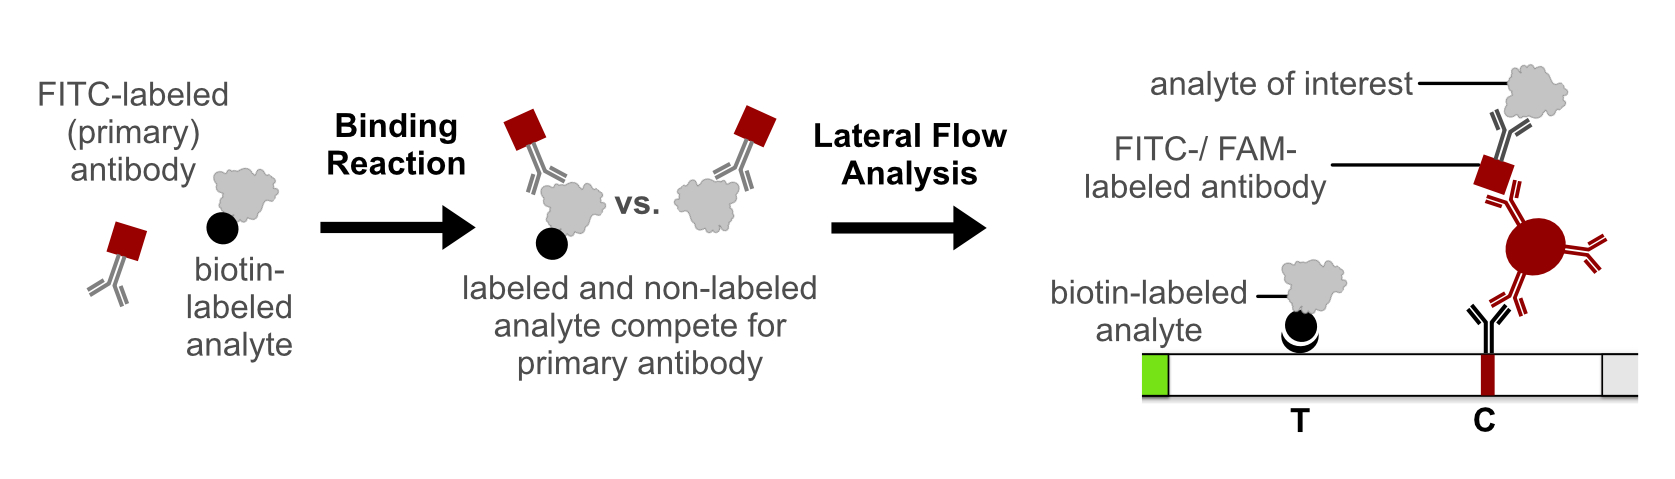 Competetive Lateral Flow Immunoassay